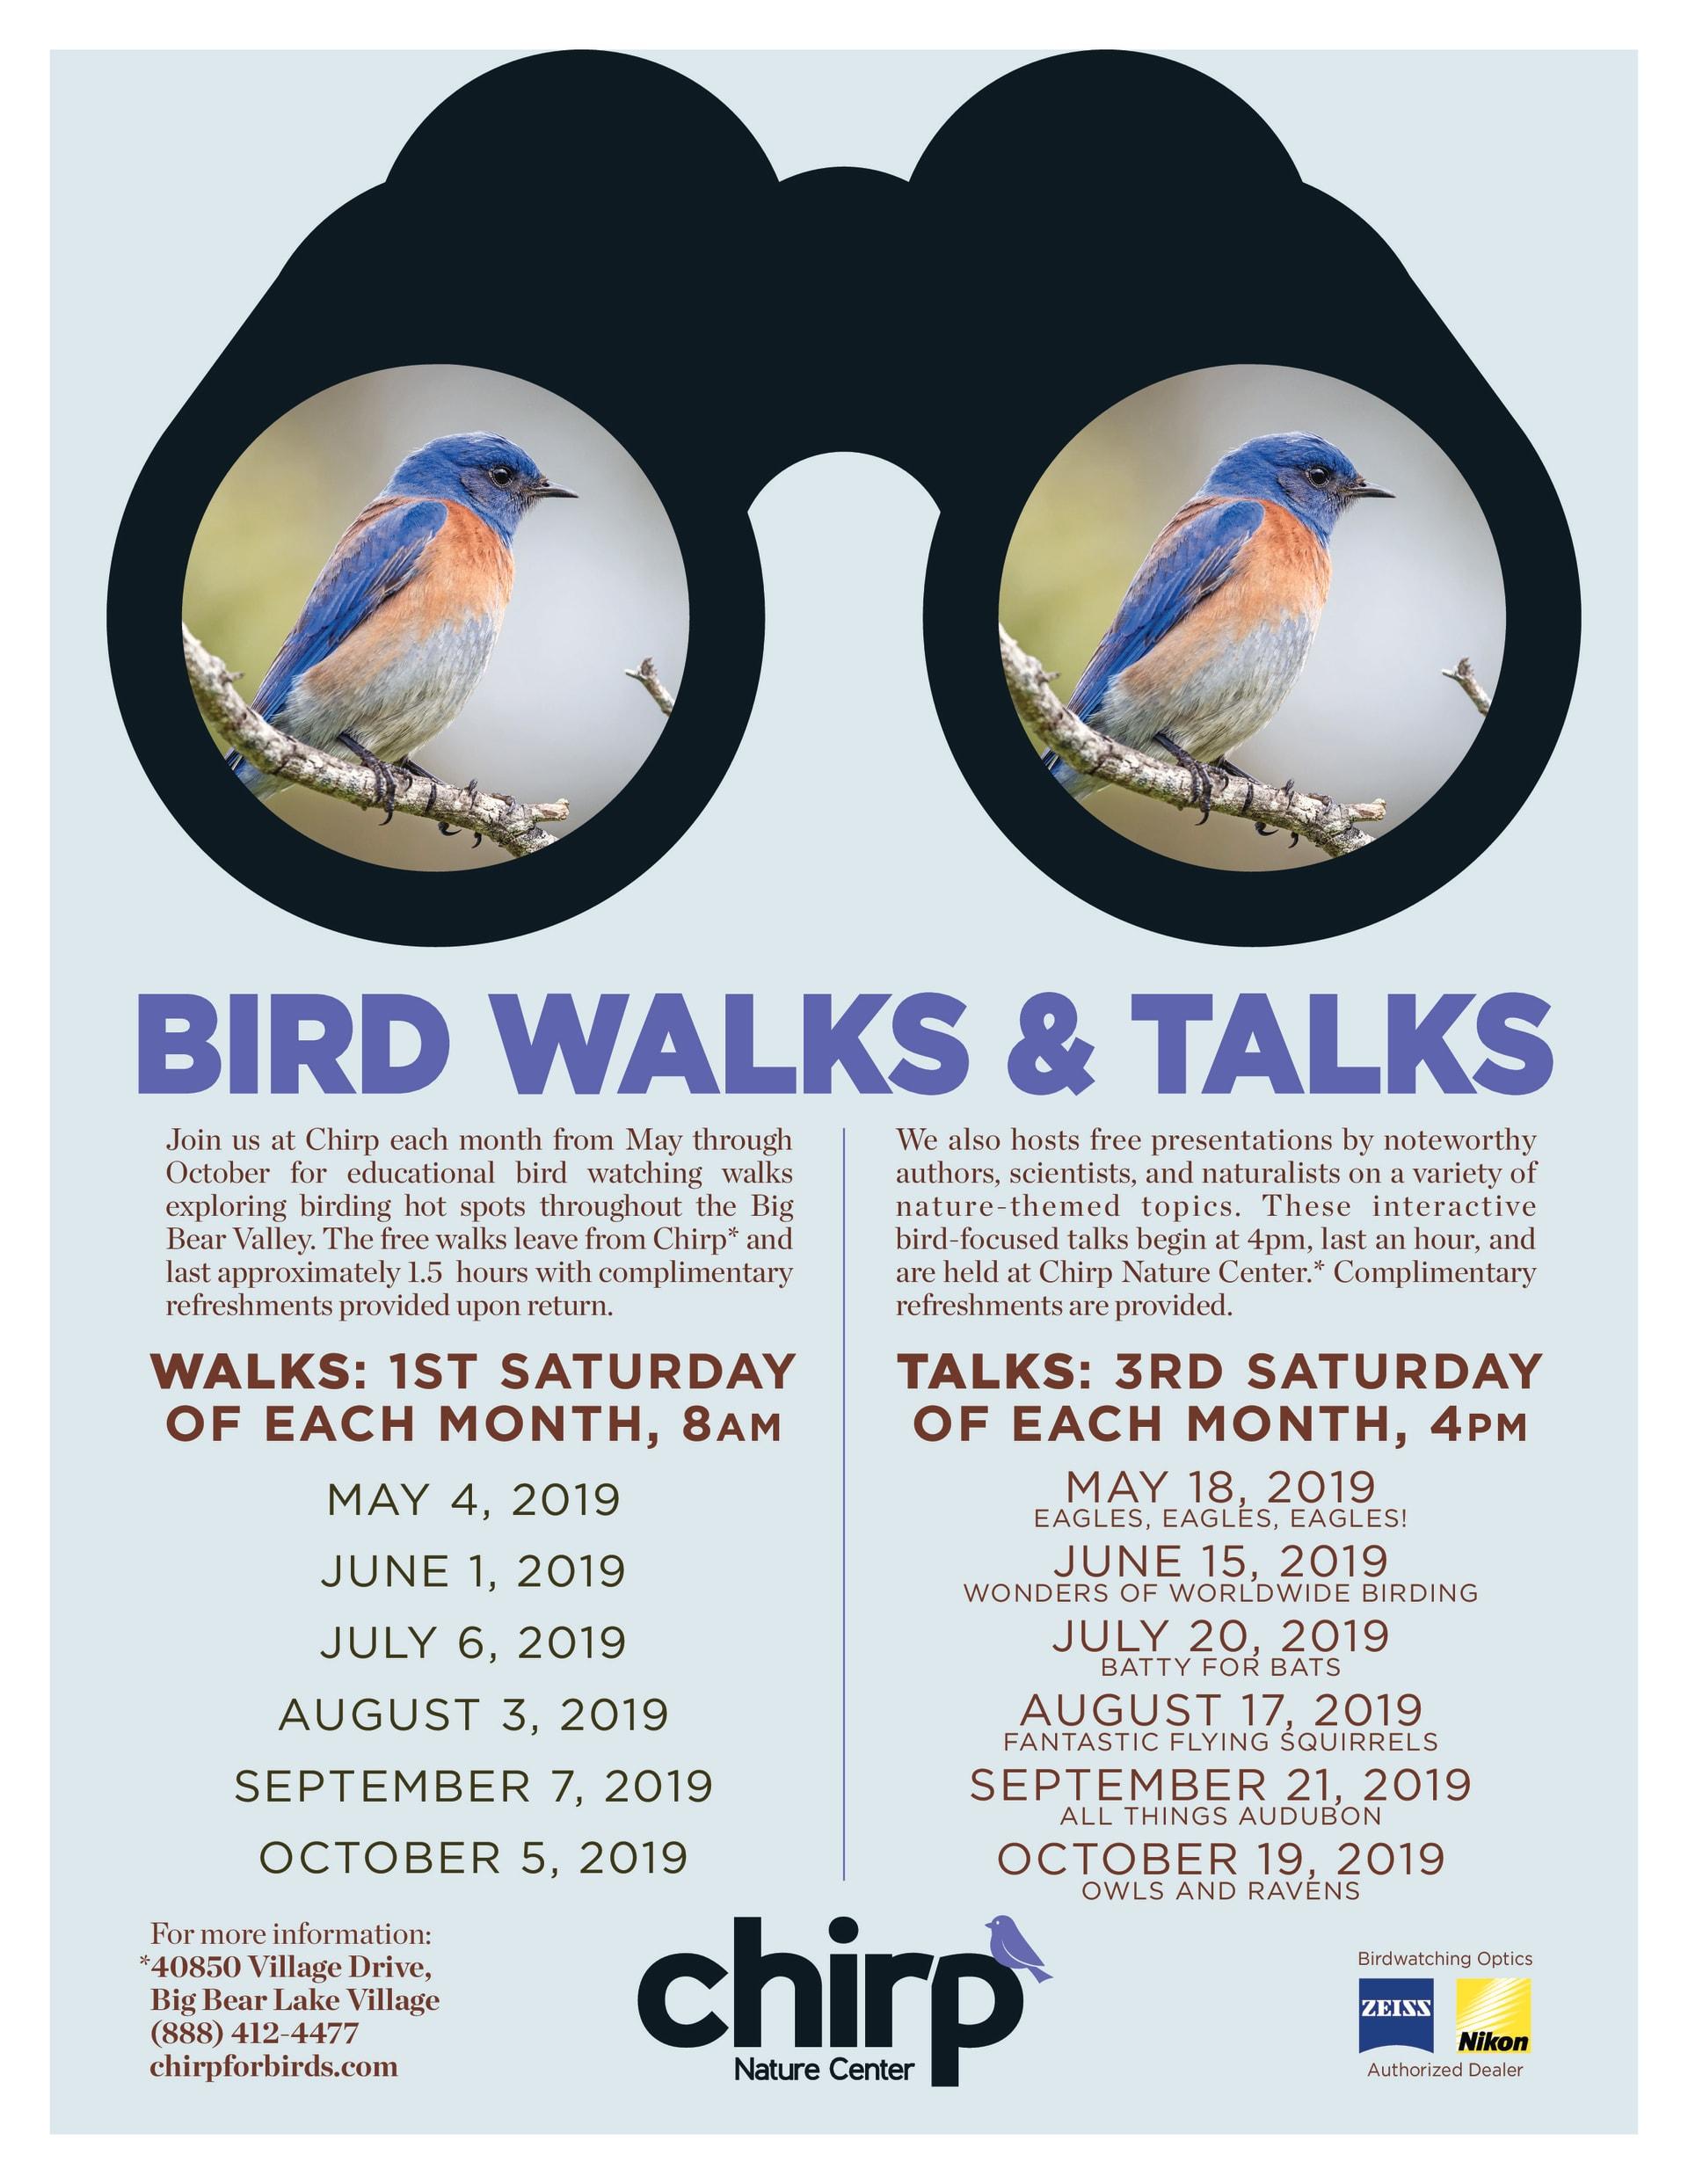 chirp_bird_walks_w1920.jpg